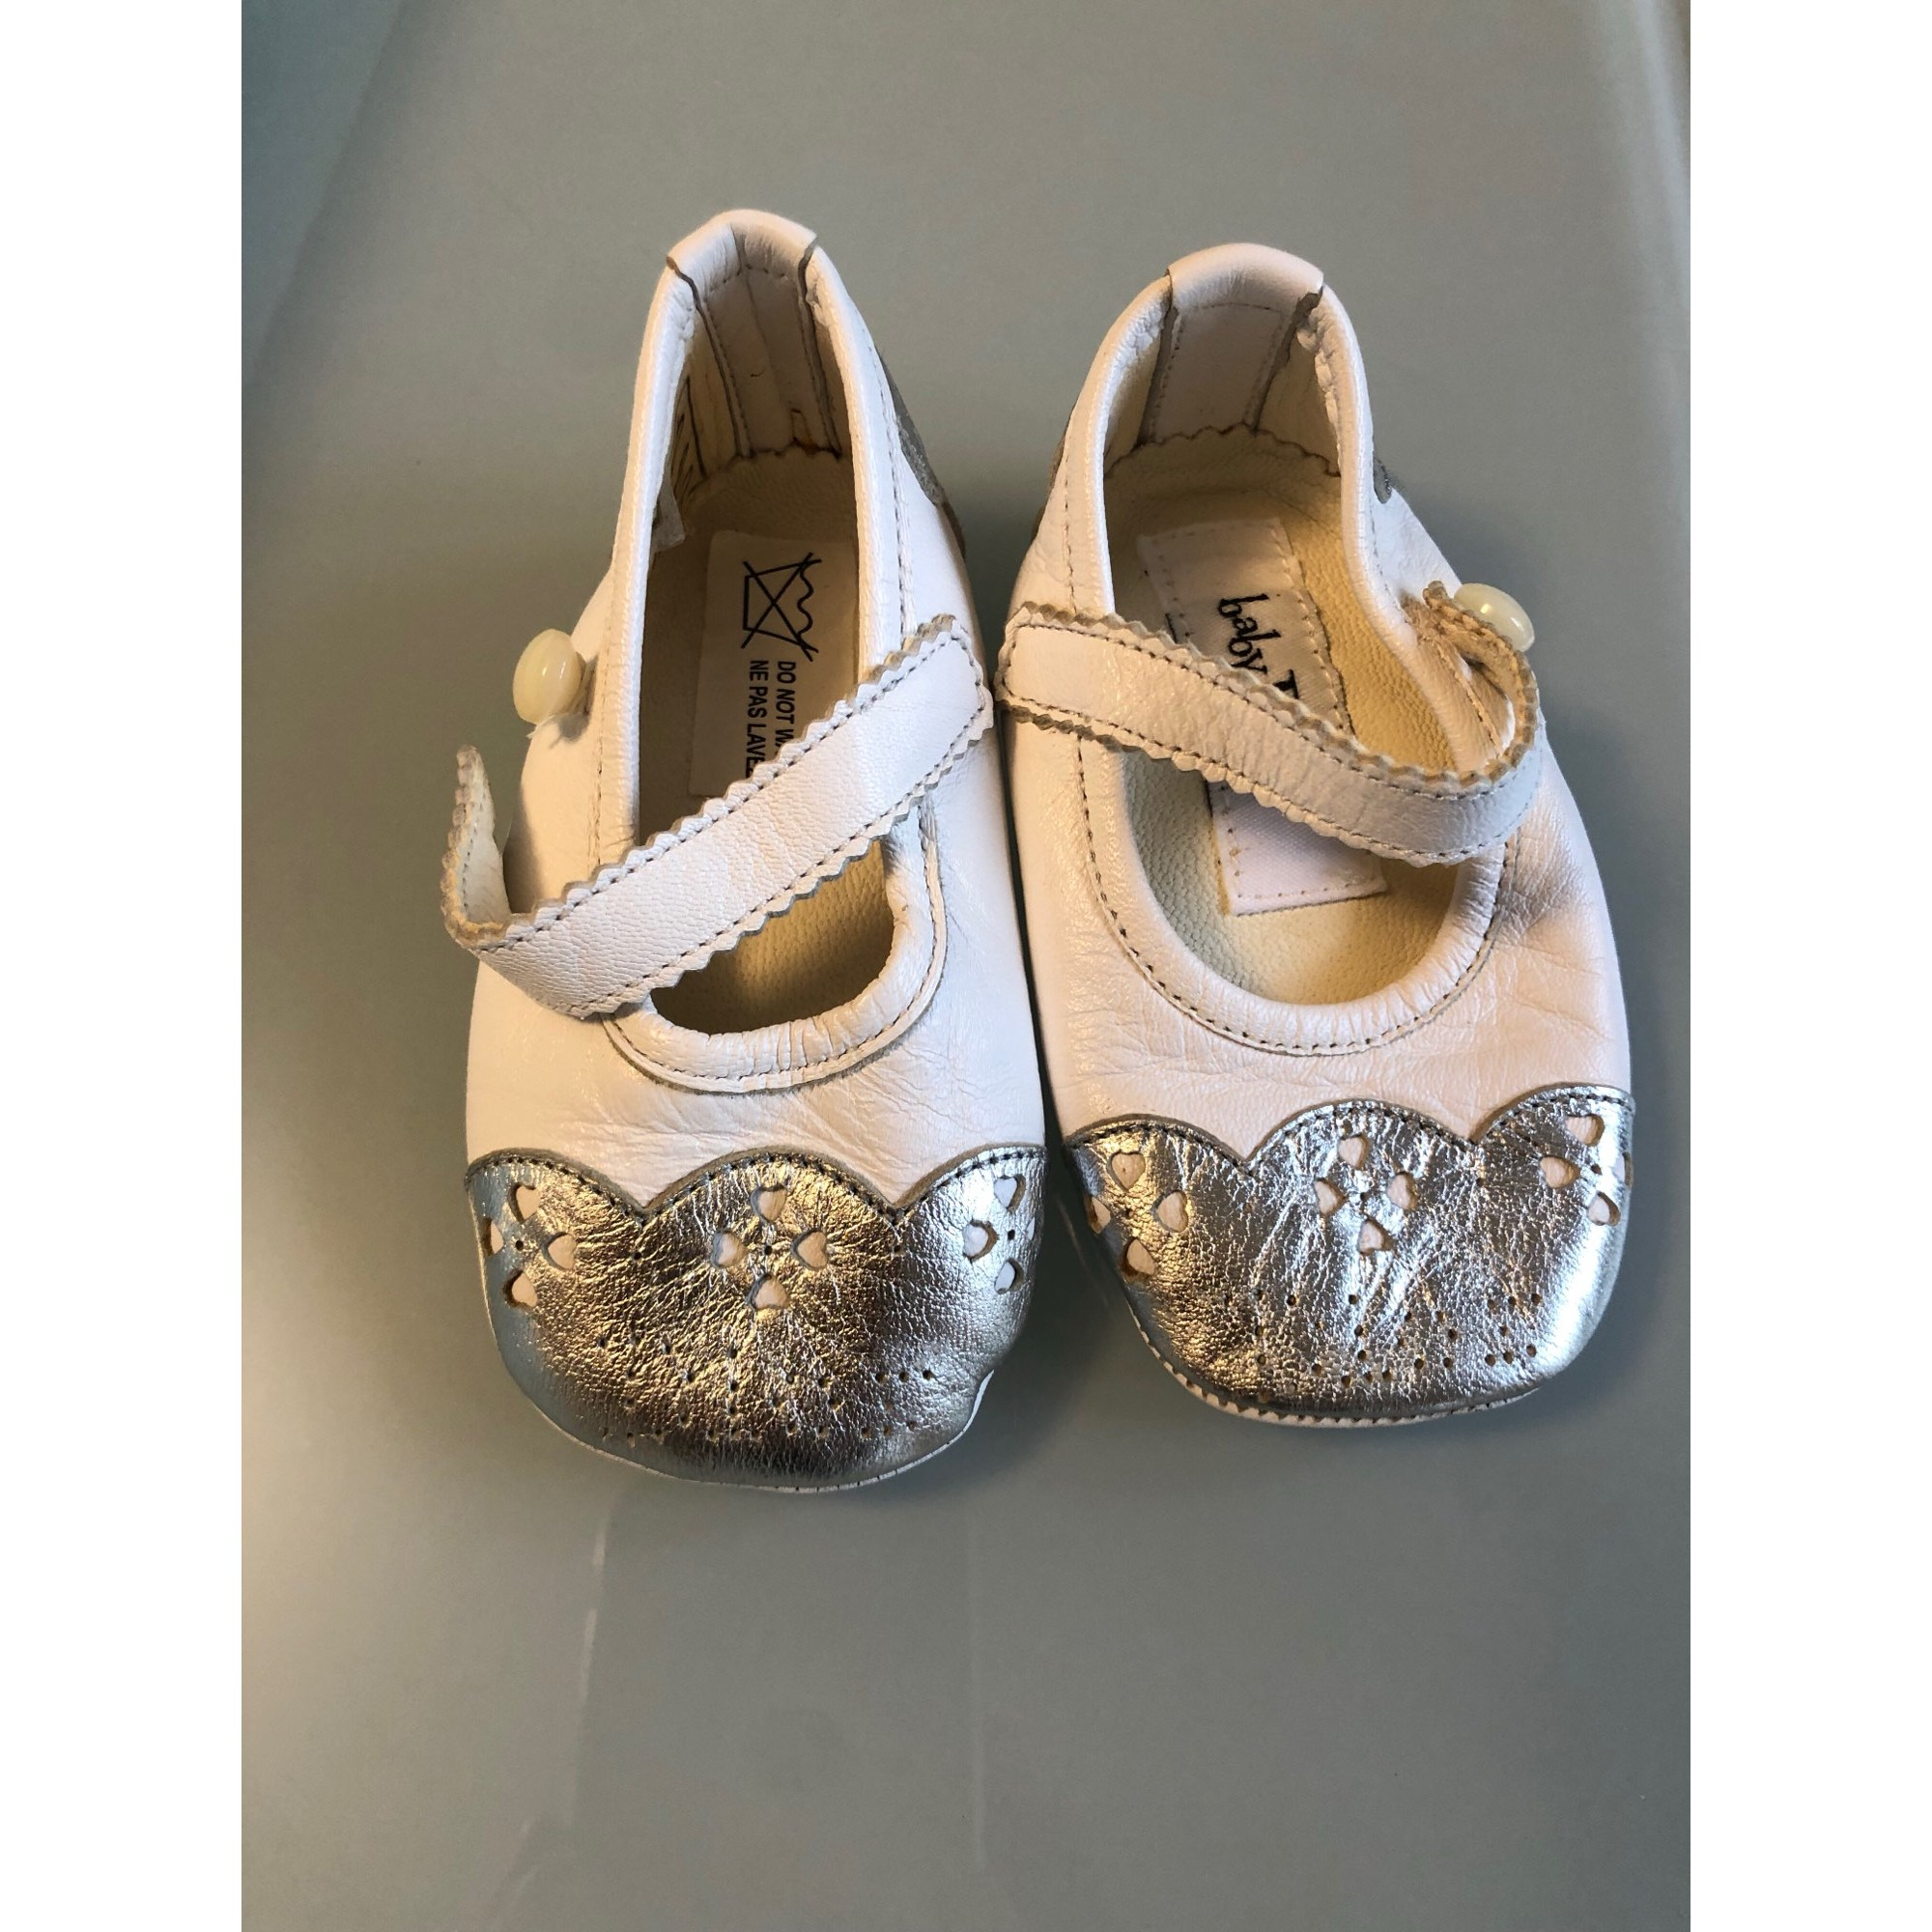 Ballet Flats BABY DIOR White, off-white, ecru